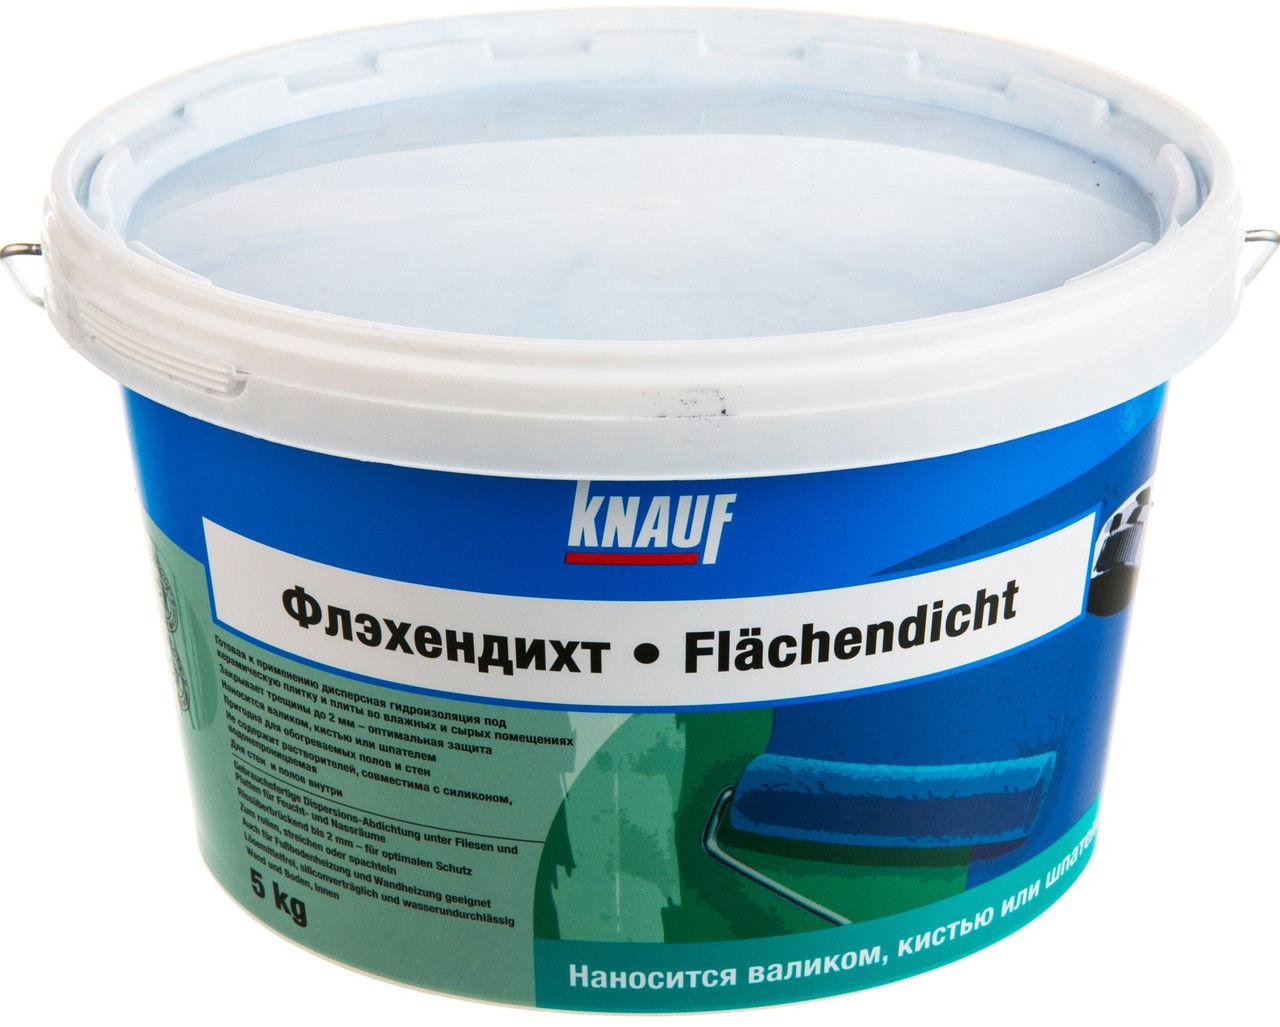 Гидроизоляция Knauf Флэхендихт водная дисперсия 5 кг